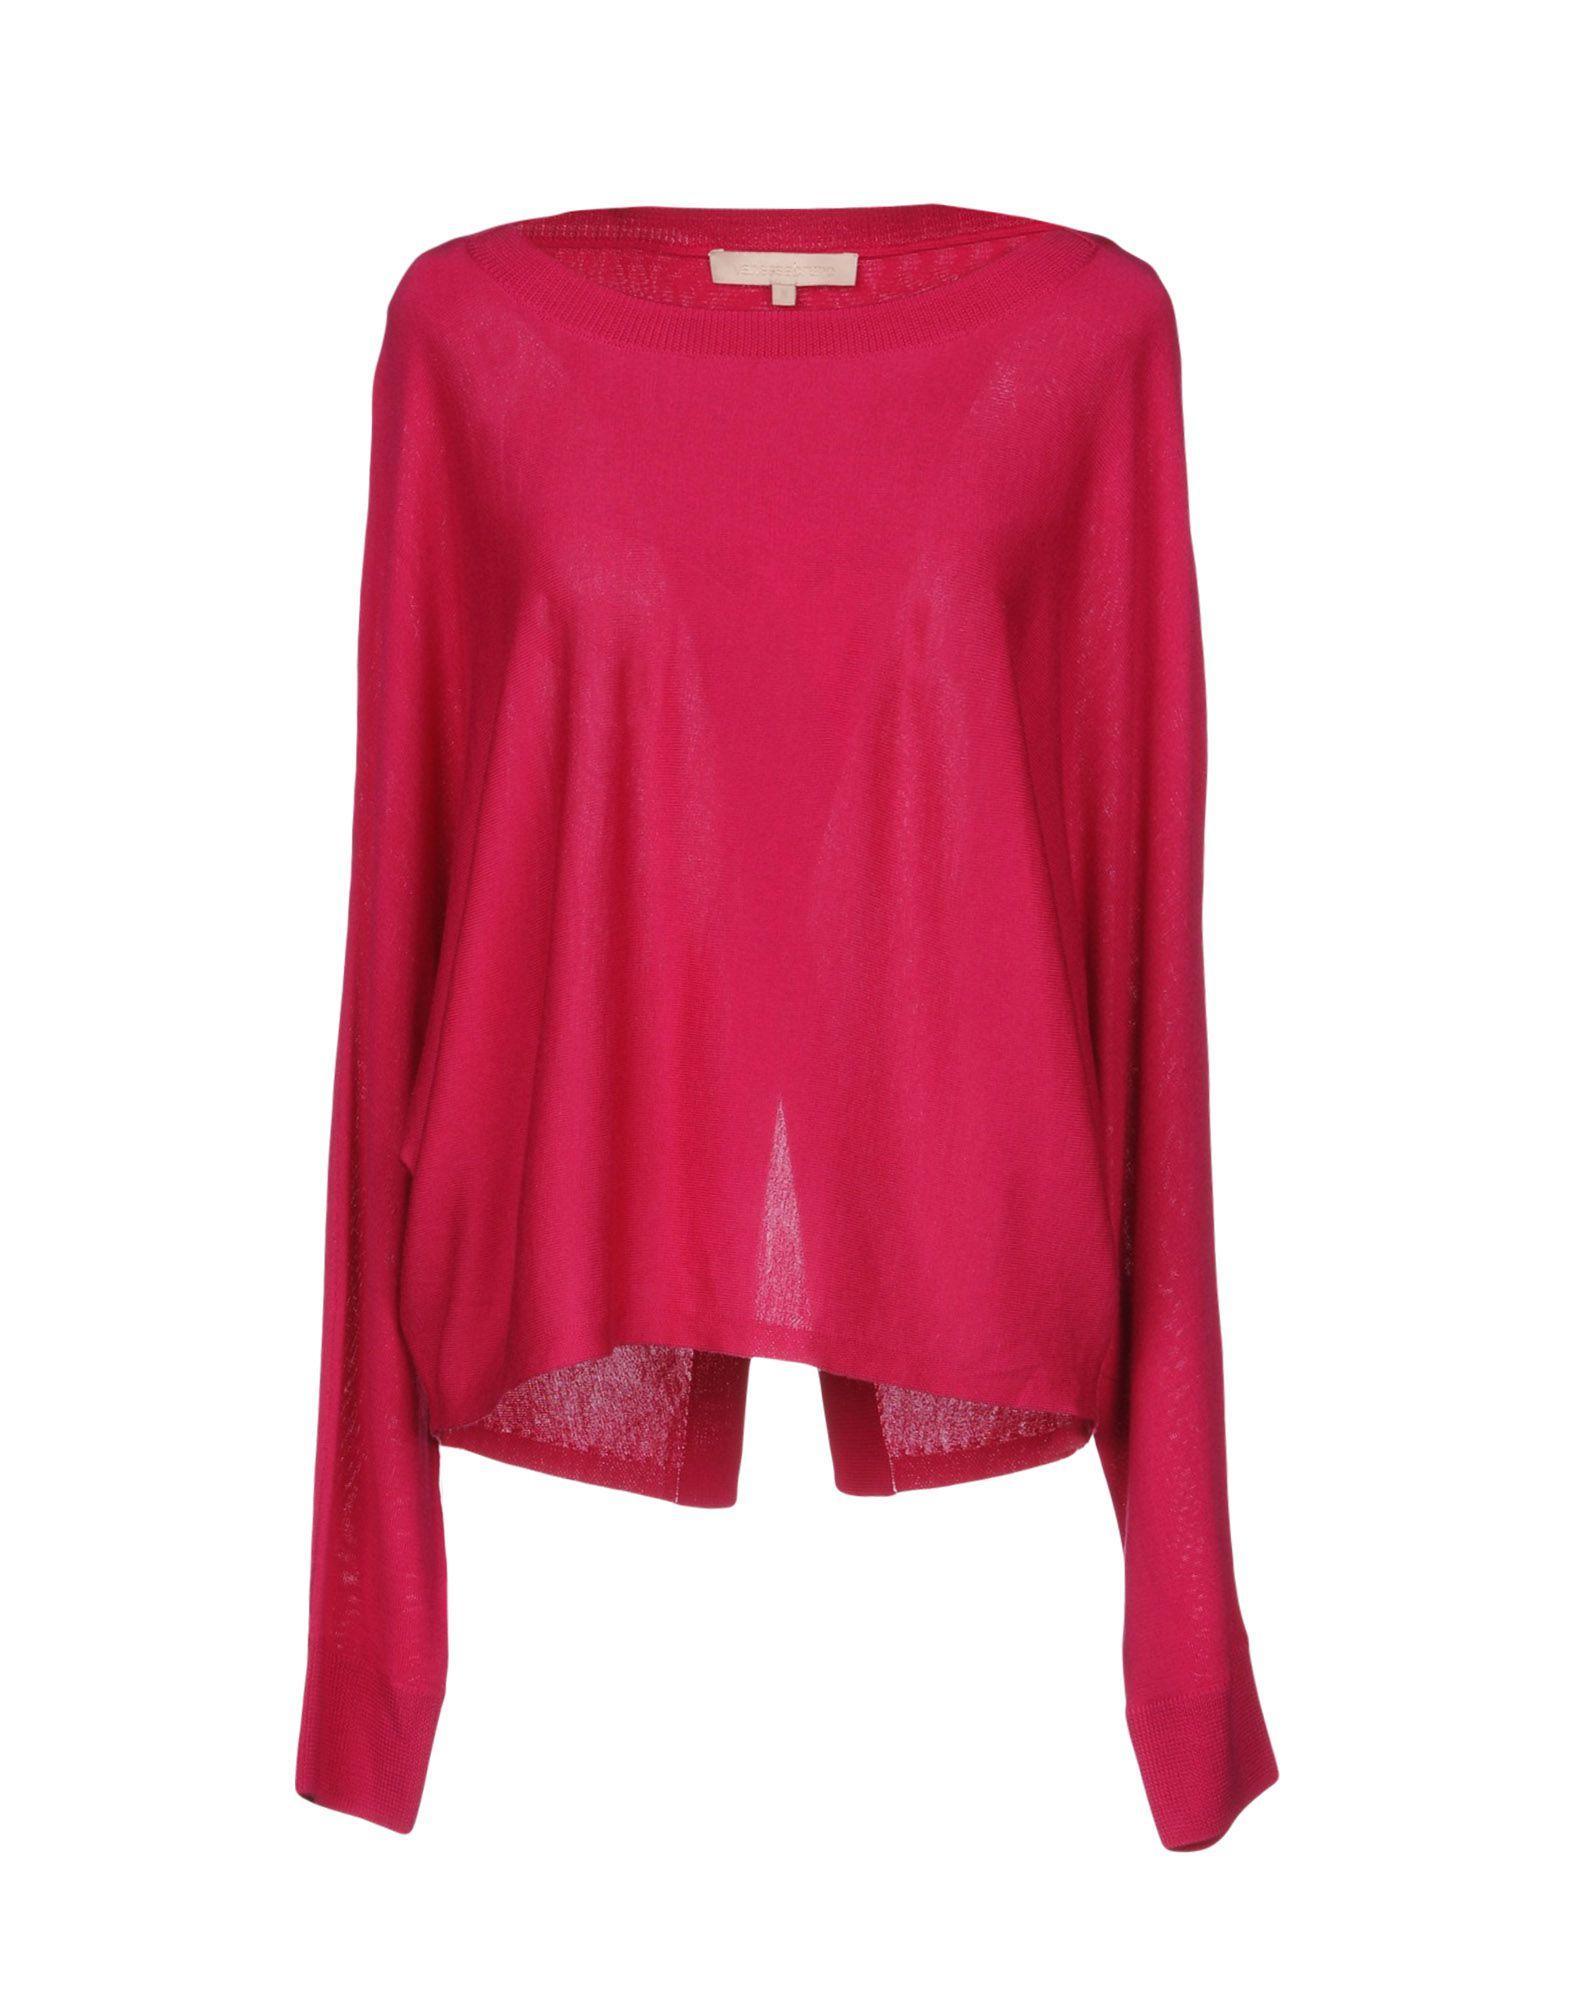 Vanessa Bruno Sweaters In Fuchsia